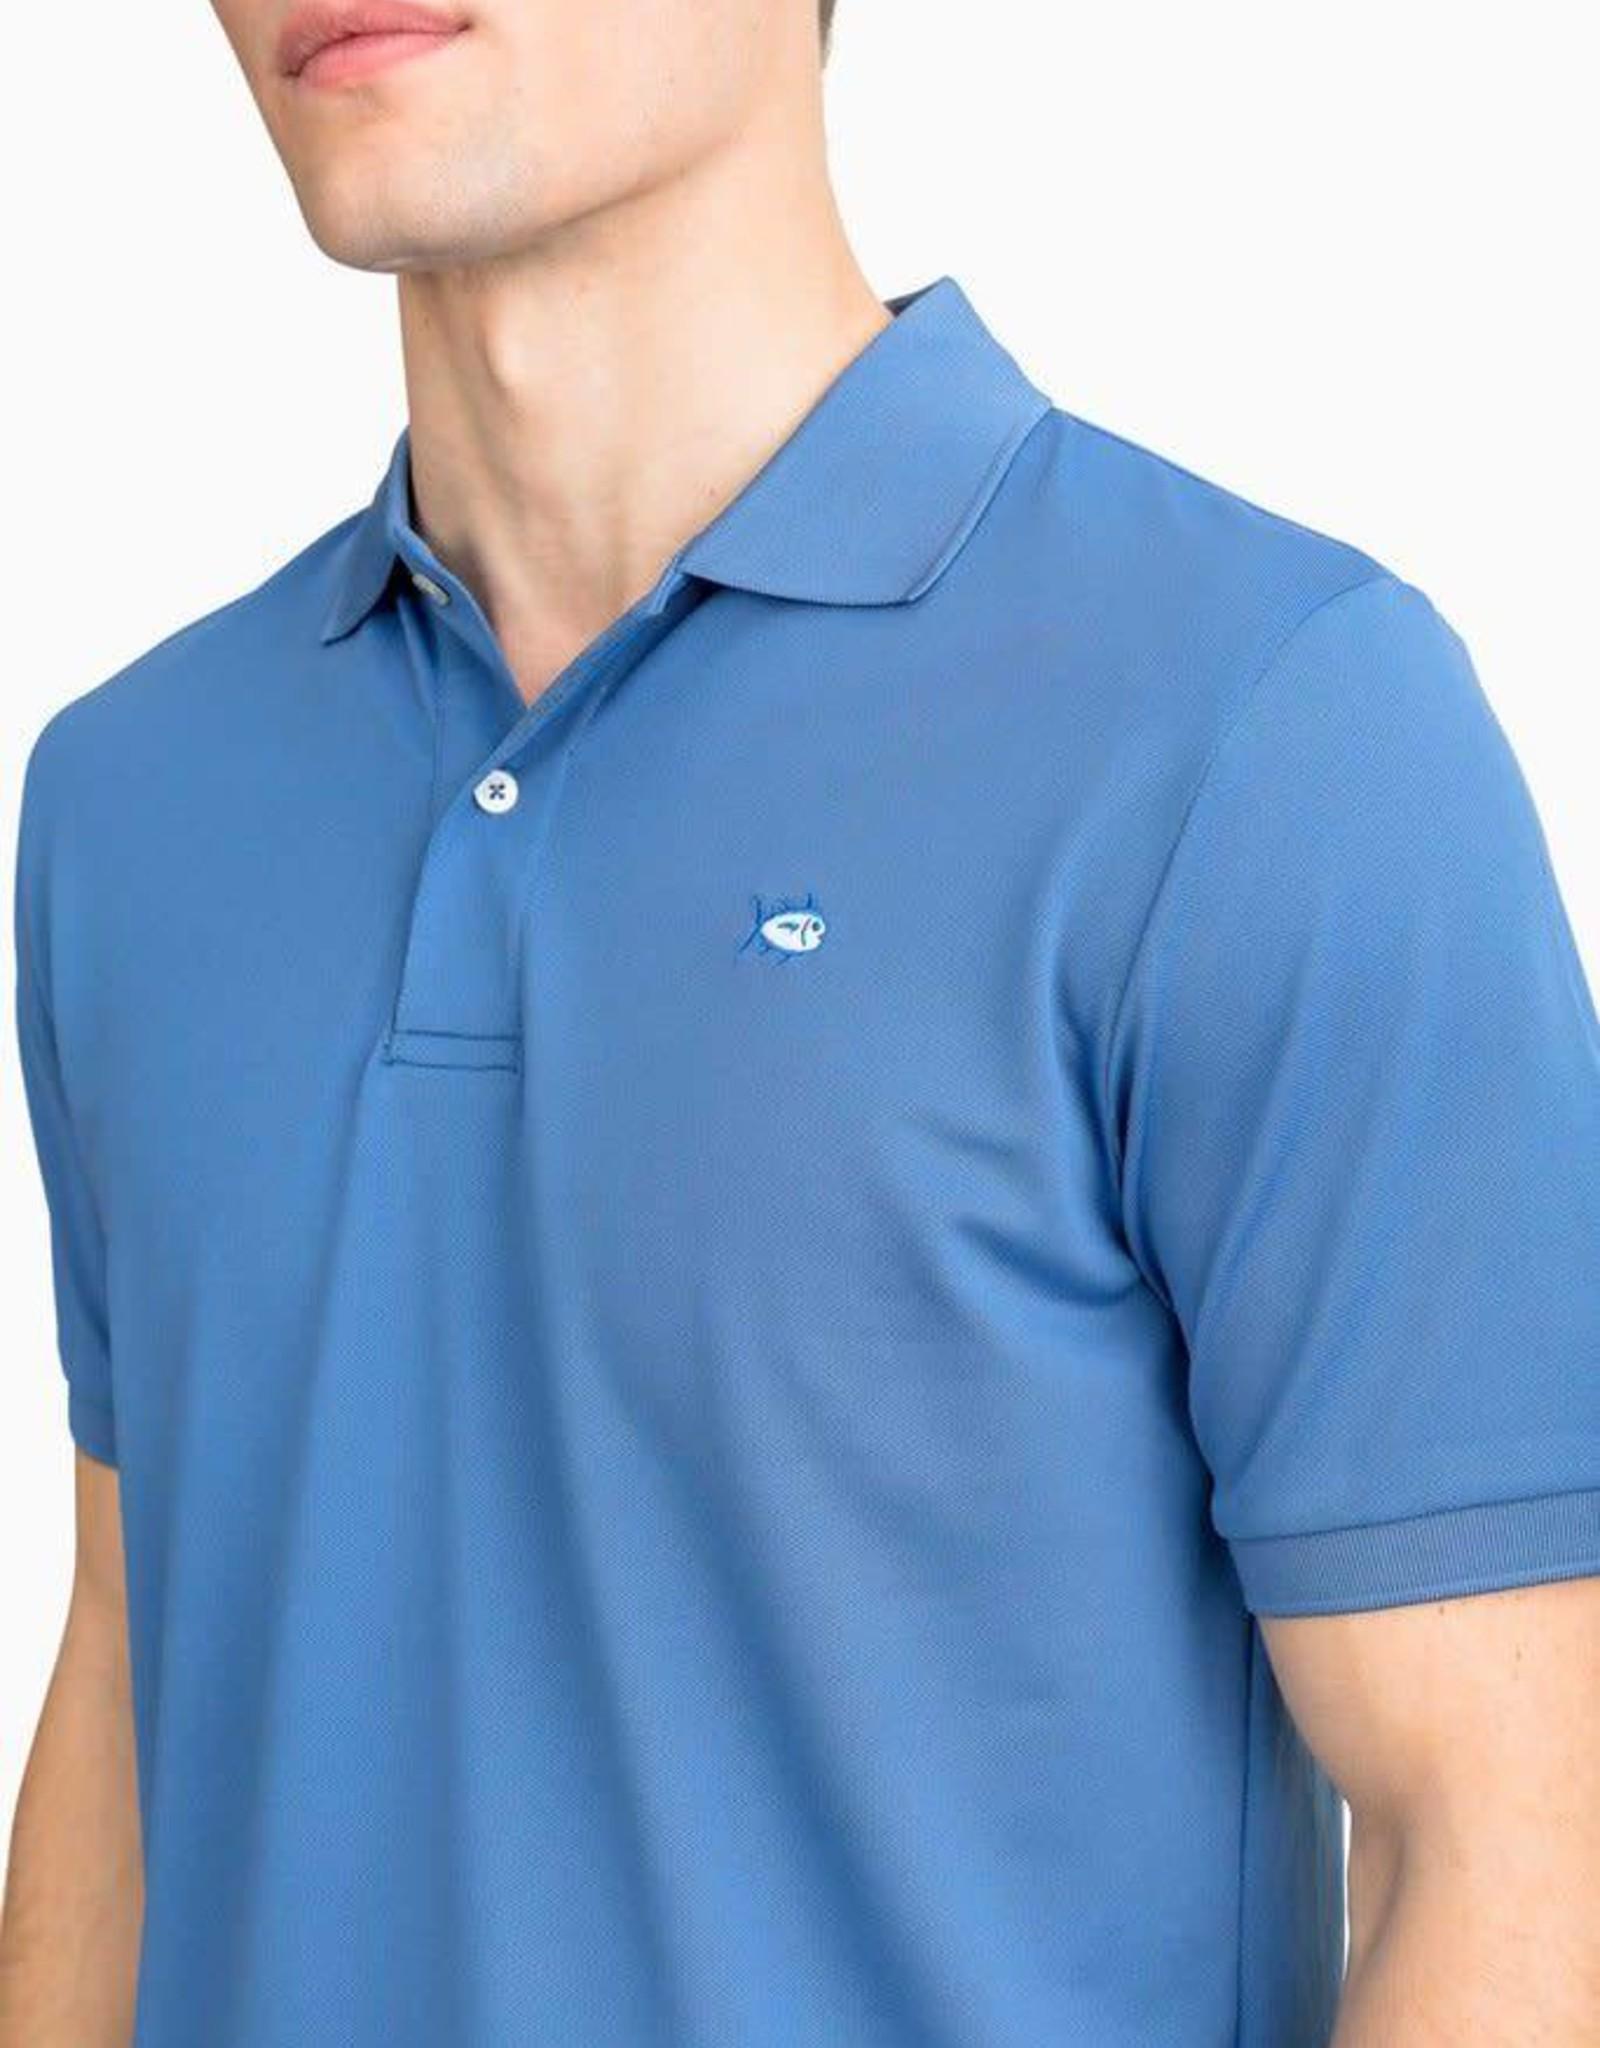 Southern Tide Jack Performance Pique Polo Shirt